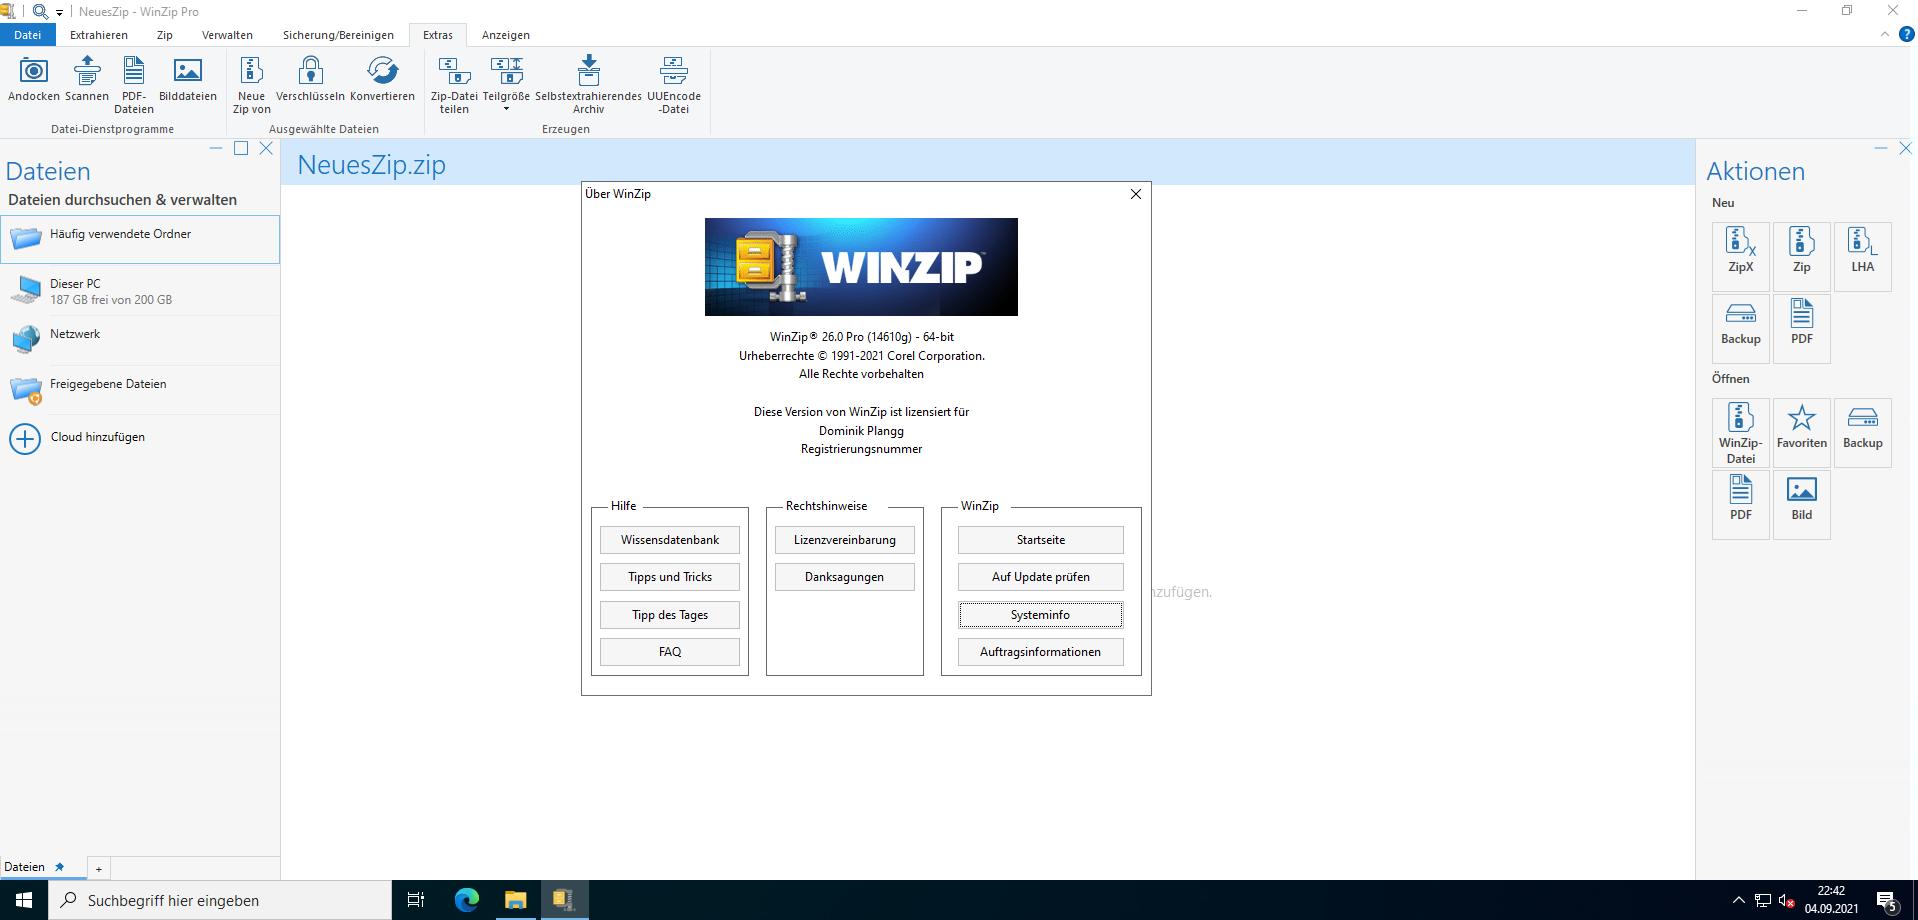 [Bild: Windows-Server-2022-Standard-2021-09-04-22-42-14.png]